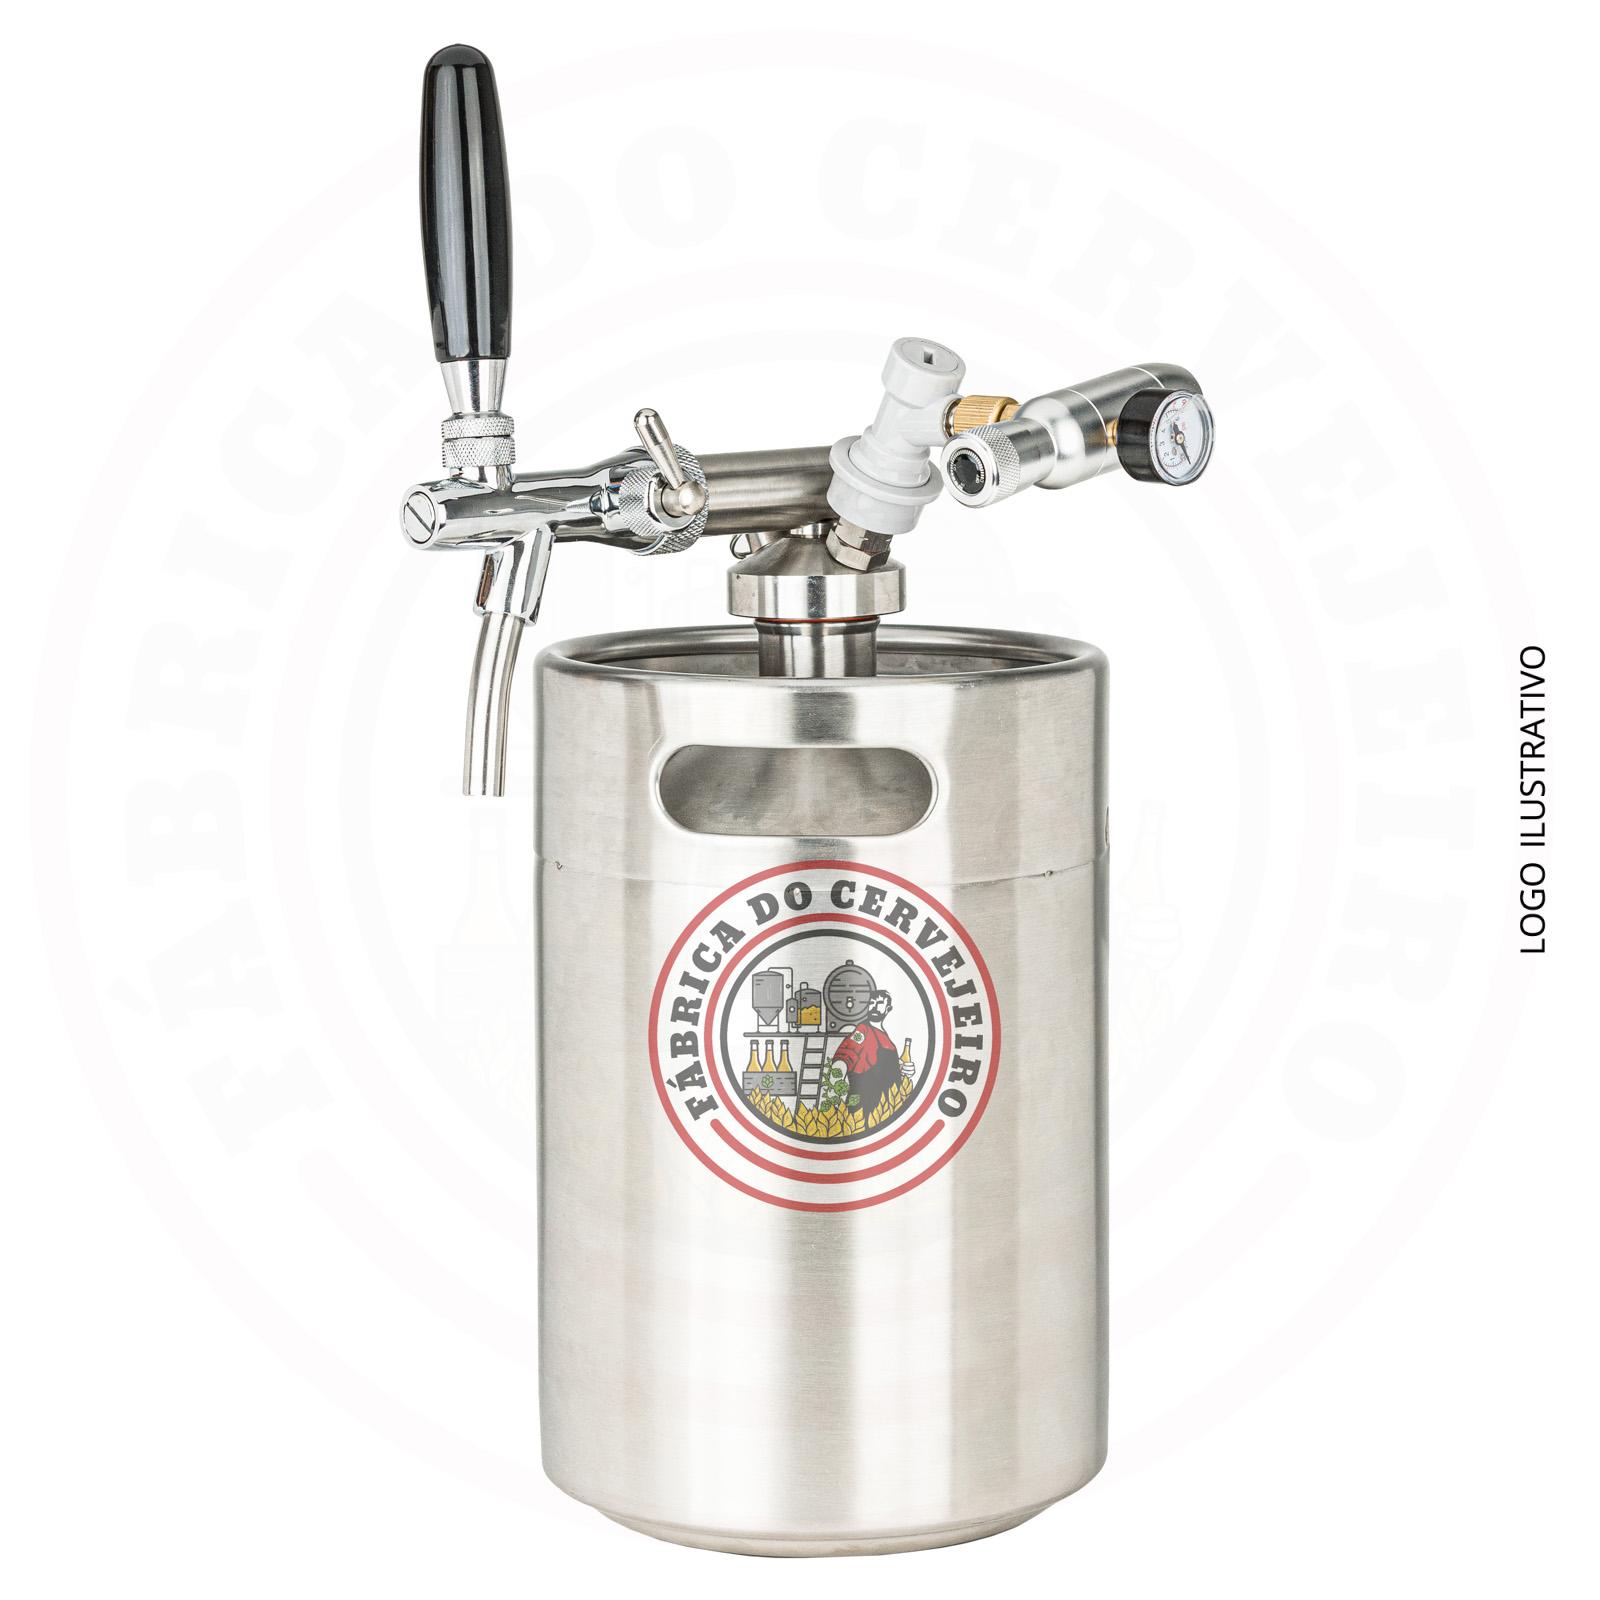 Kit mini keg growler 5L com torneira italiana e mini regulador hobby